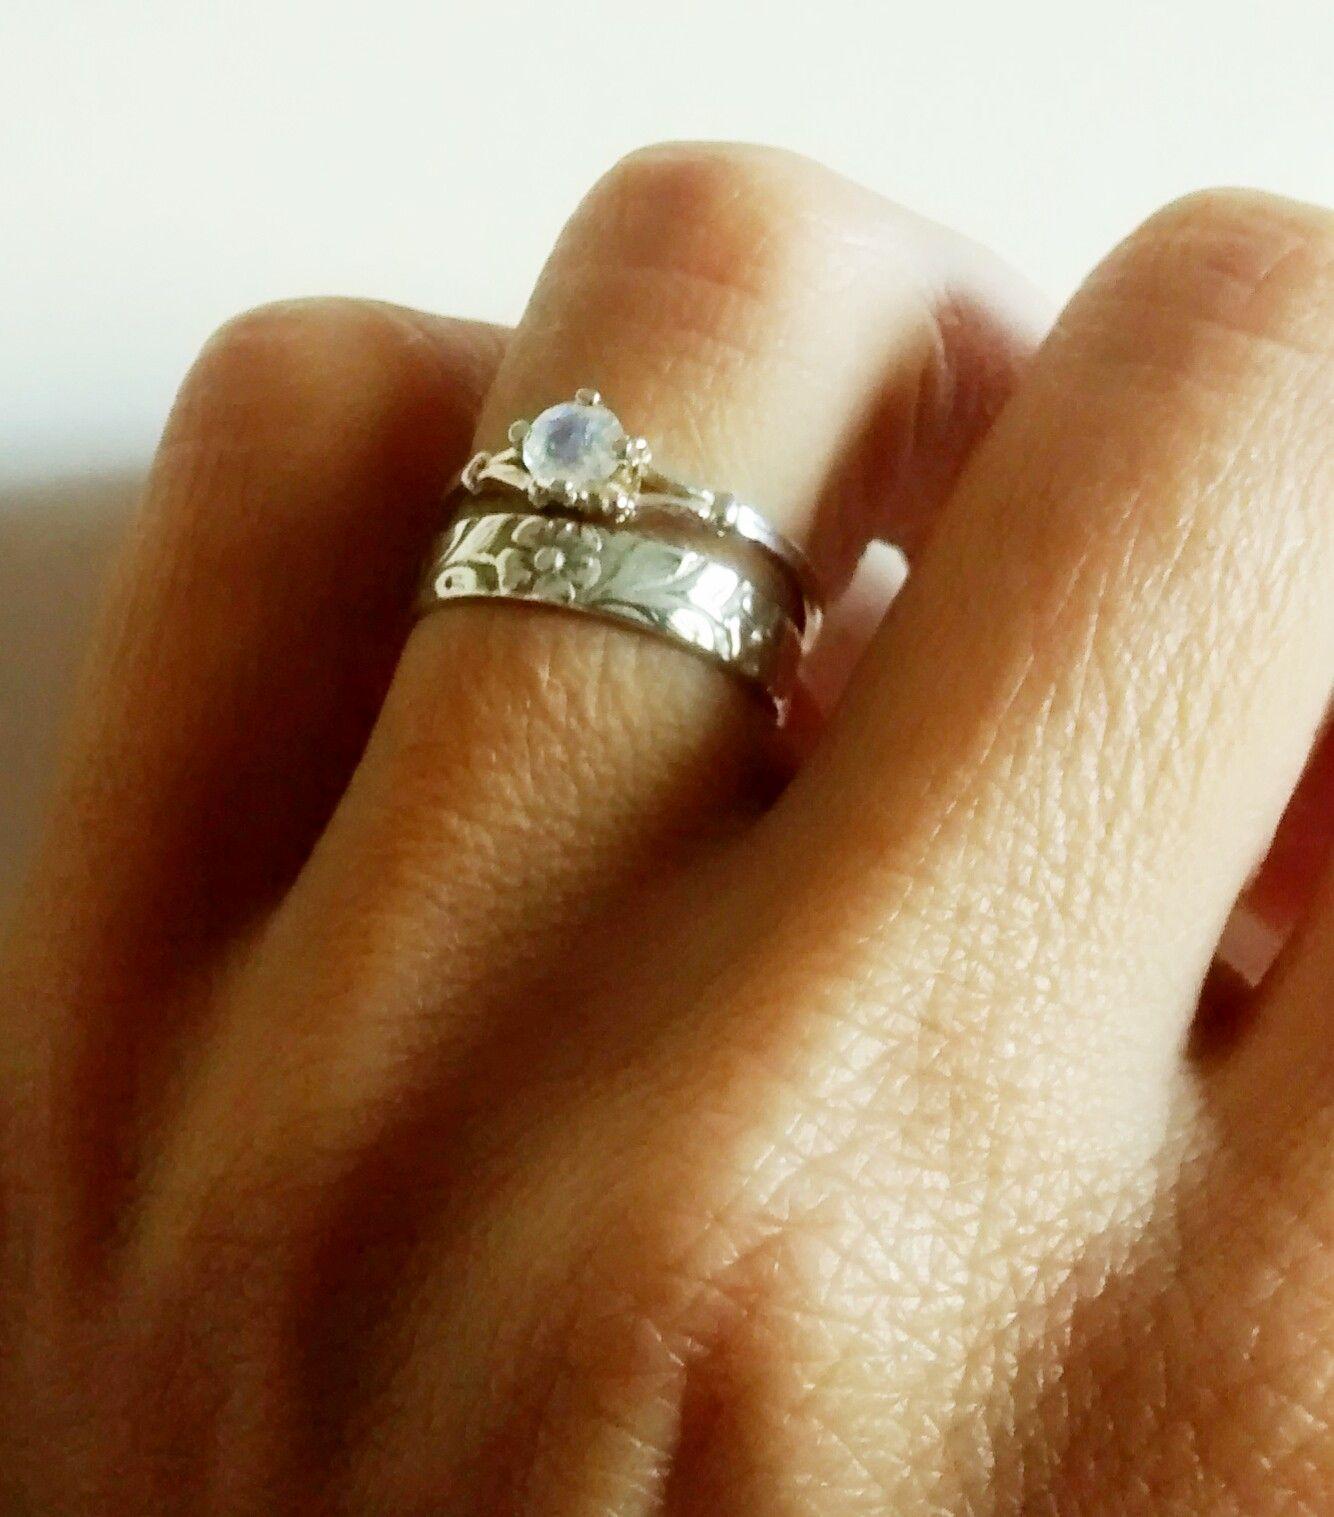 moonstone wedding band Faceted moonstone ring wedding band Gorgeous